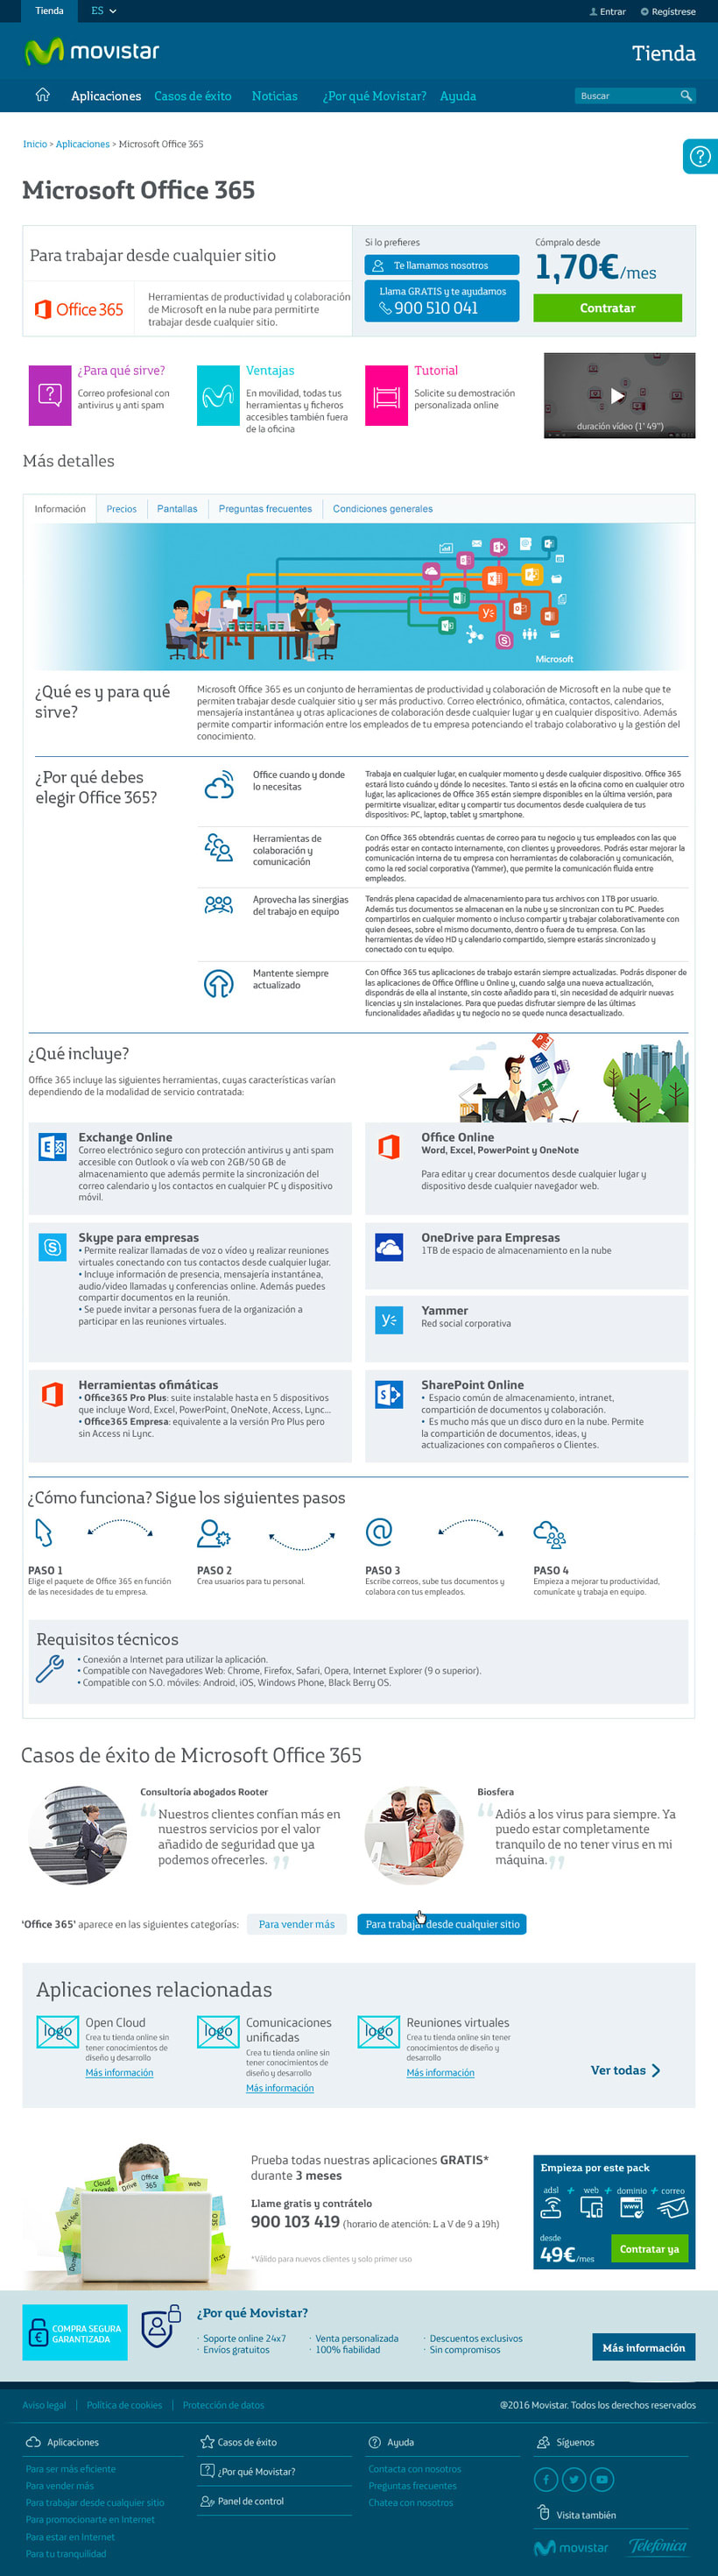 Marketplace servicios cloud 10